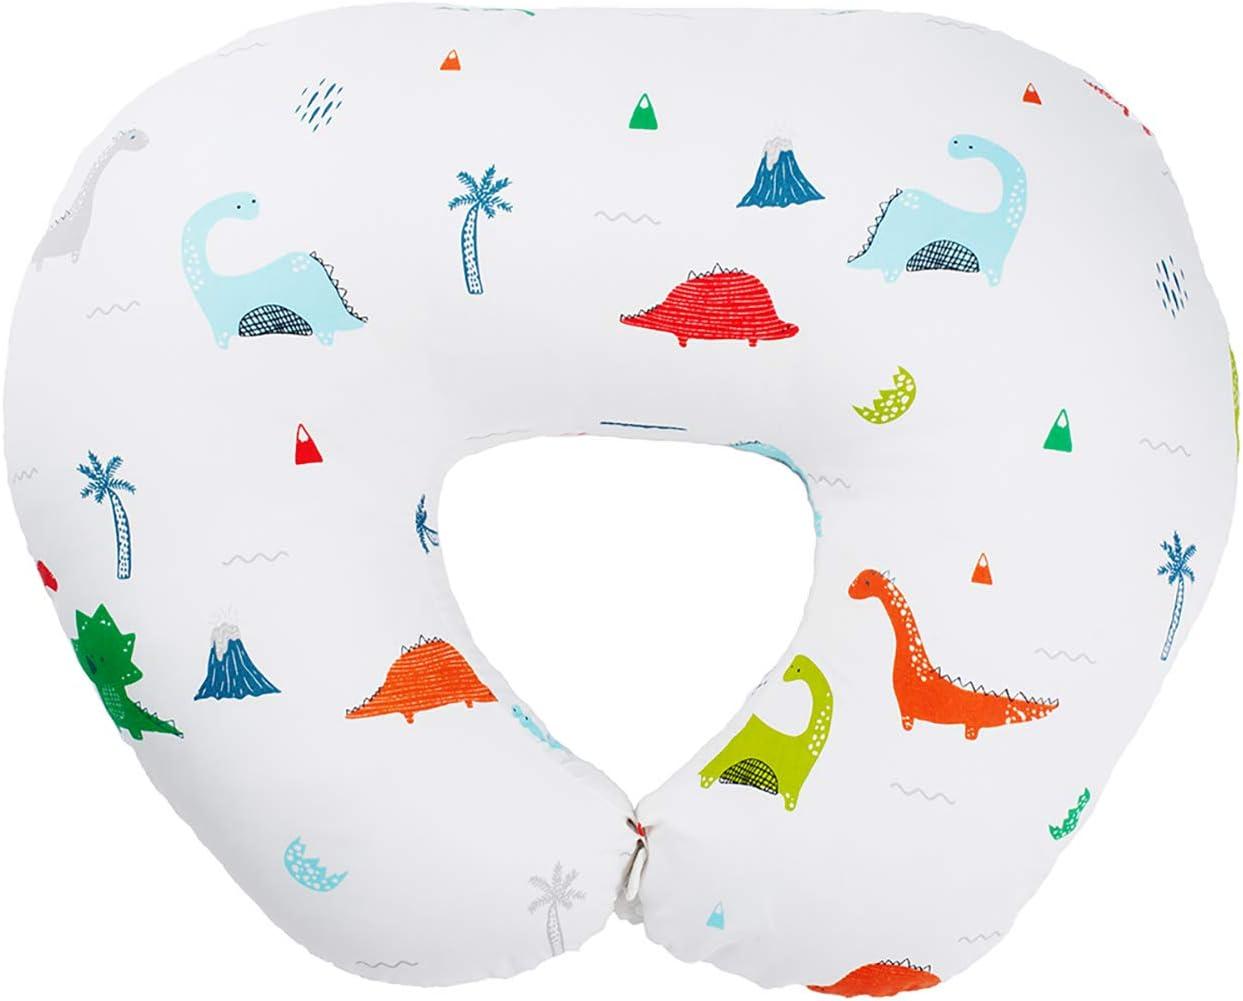 BESTLA Breatsfeeding Pillow and Positioner, Cute Dinosaur Design Nursing Pillow Widened Feeding Support Platform Design 100% Cotton Fabric